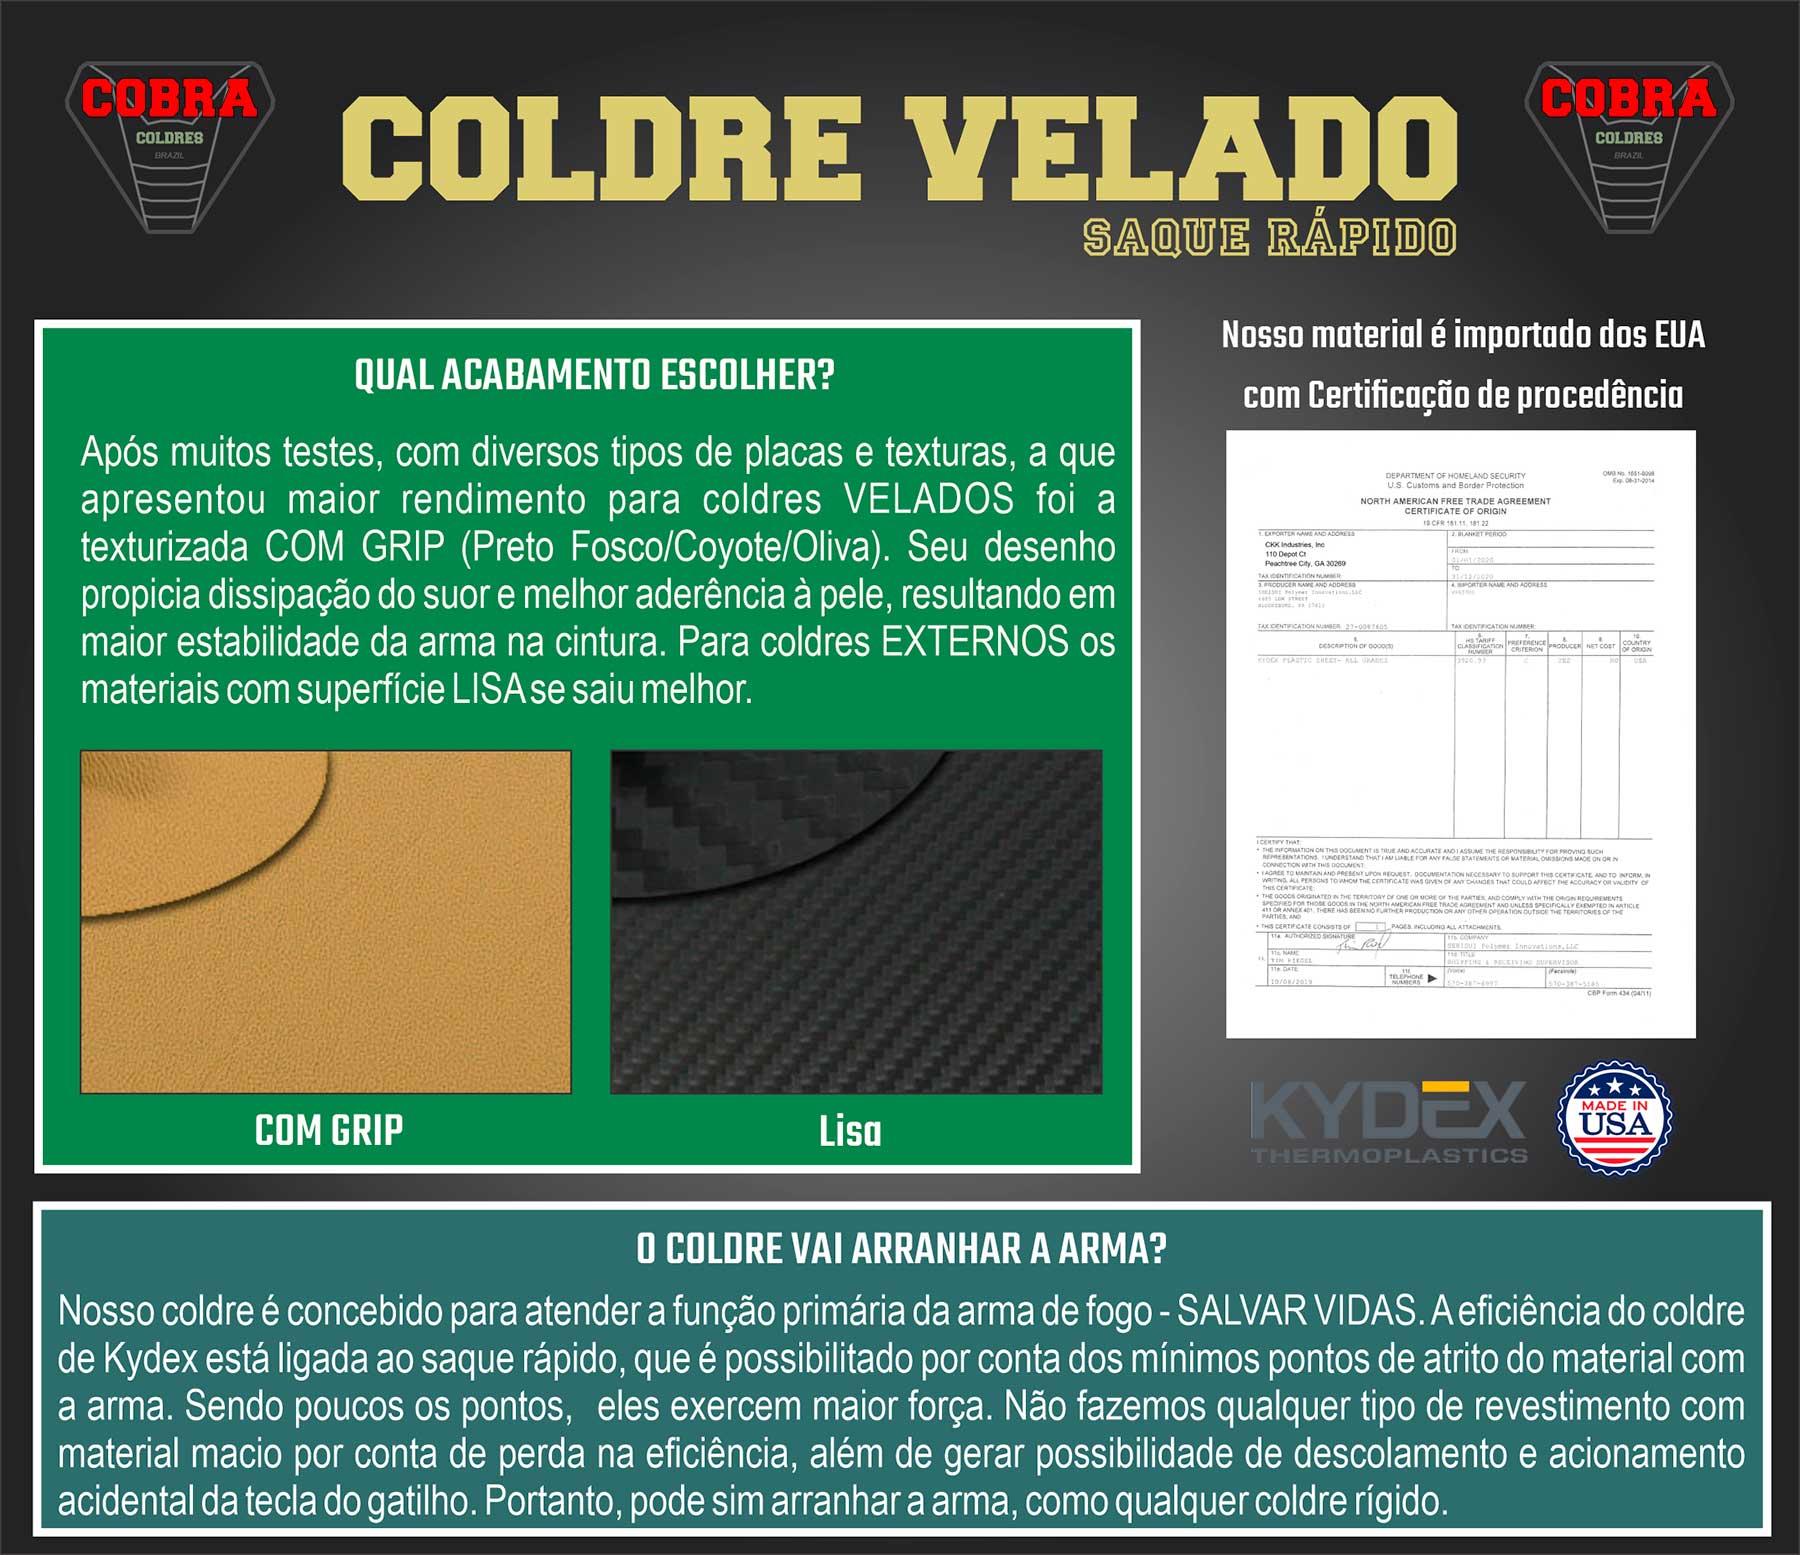 Coldre Kydex [RT692] [692] Revólver Taurus Tracker  692 Multicalibre 9mm/357 [7 Tiros] [3 Polegadas]